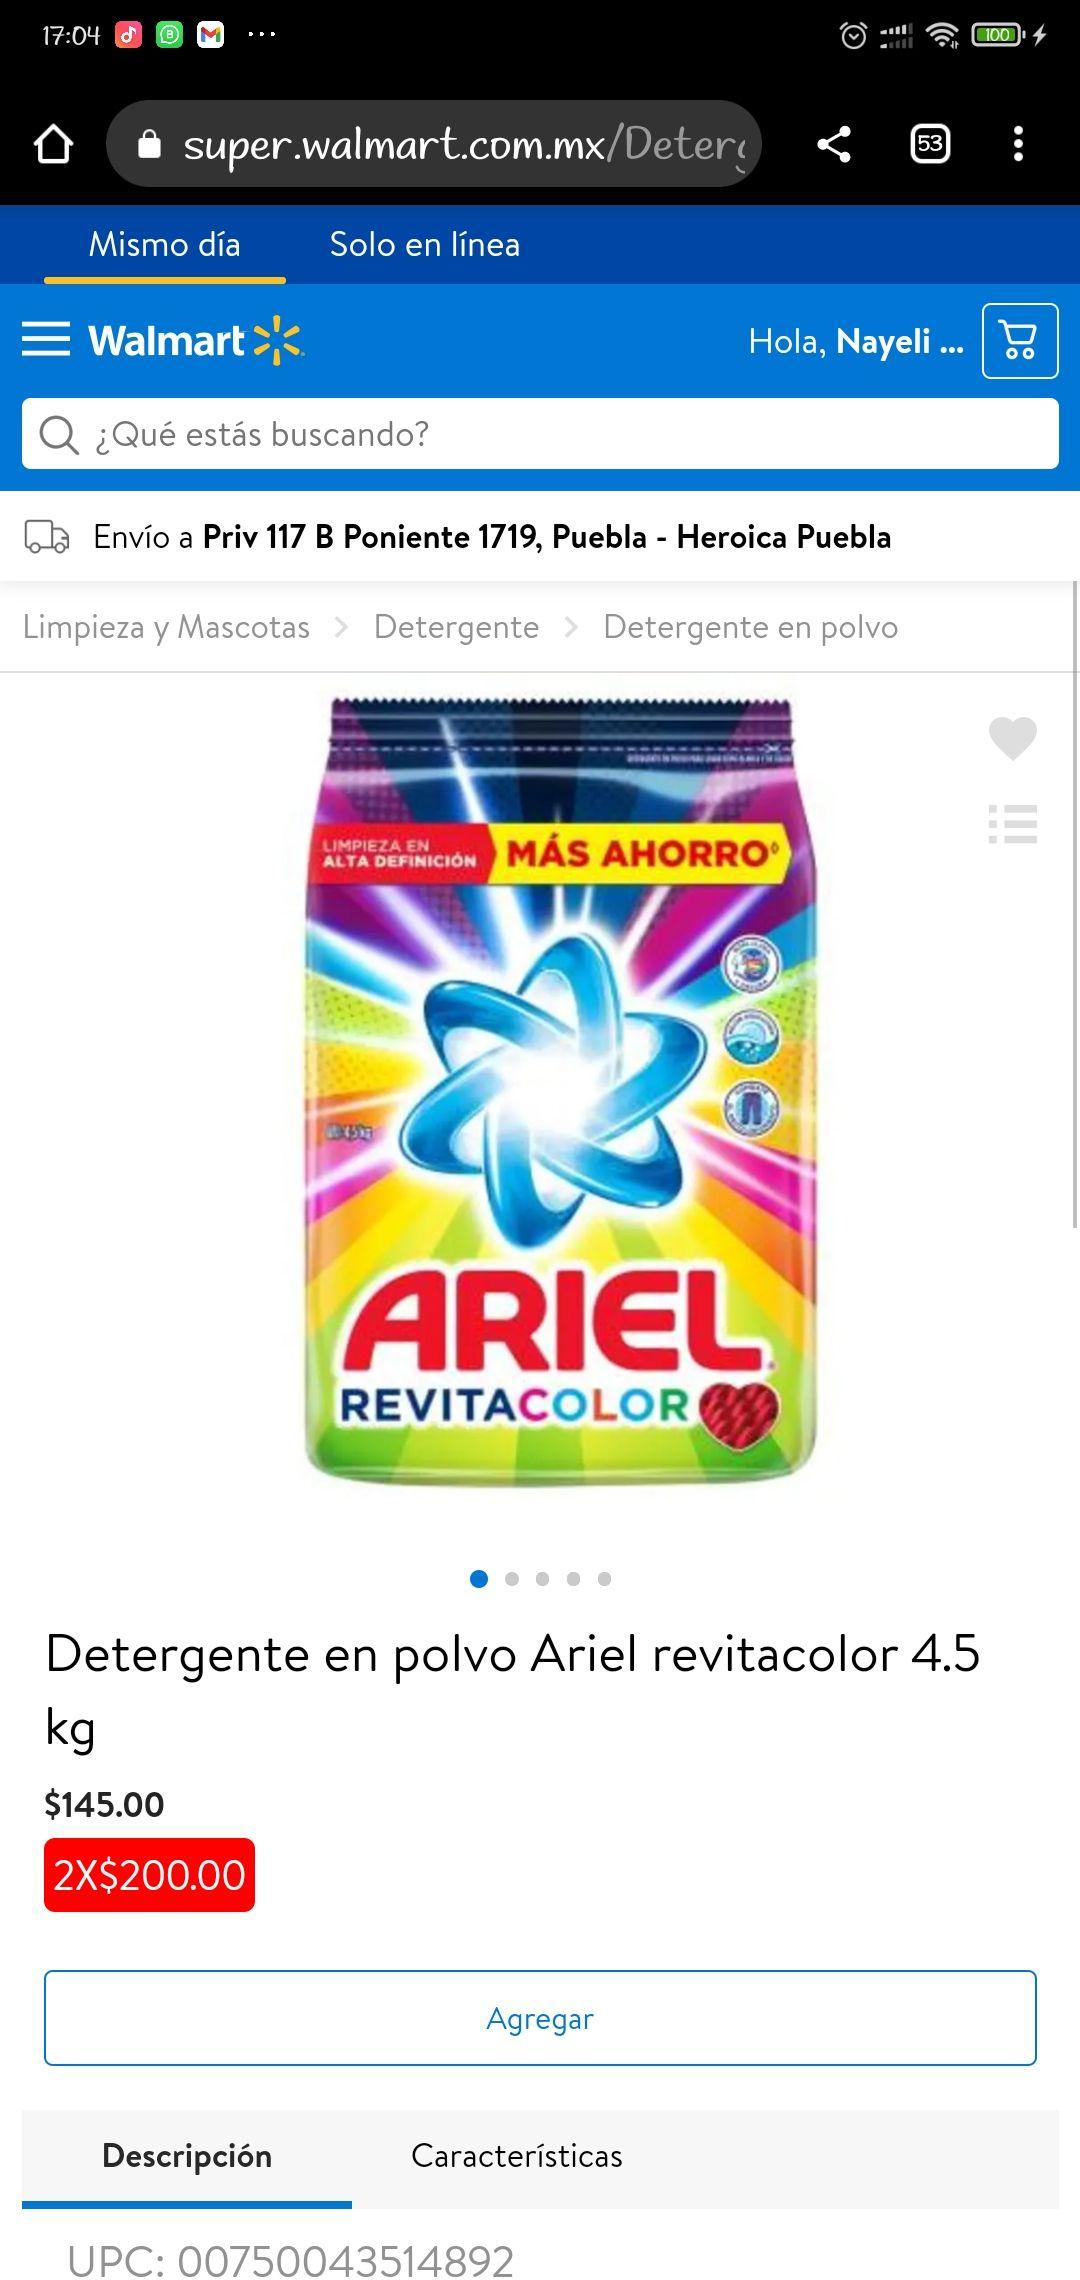 Walmart: Detergente Ariel Revitacolor 4.5 Kg. Kg